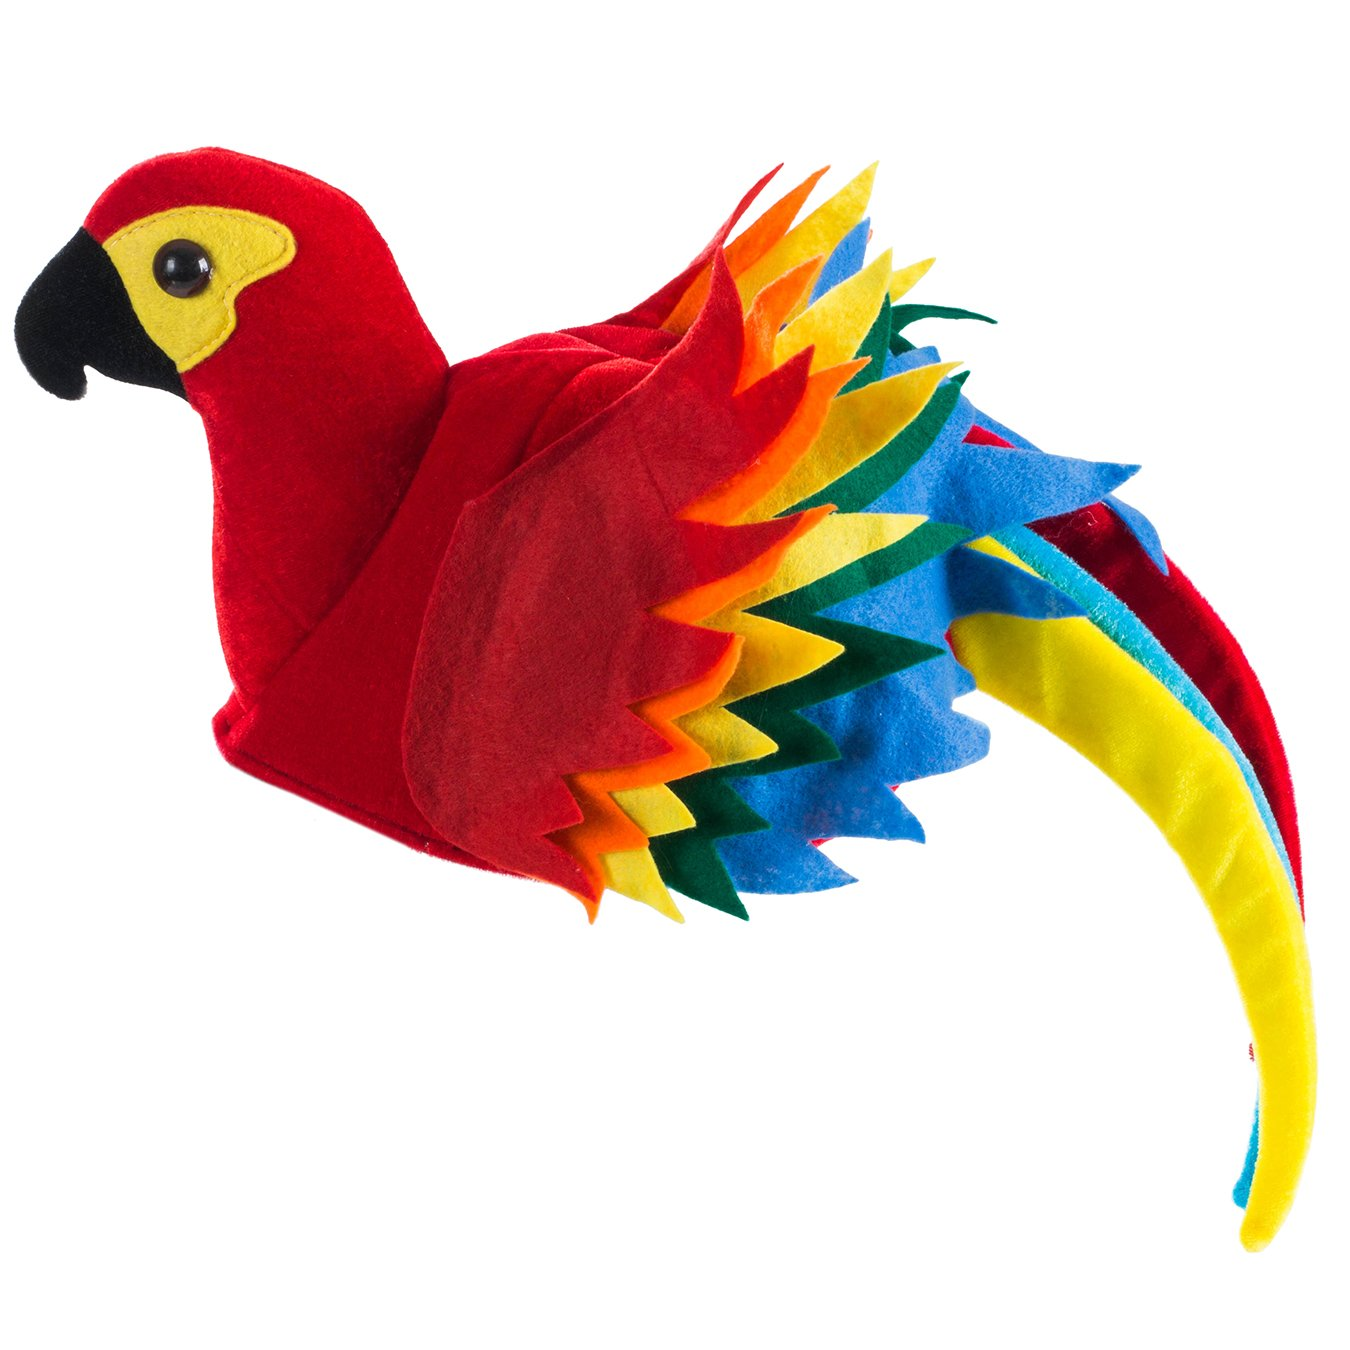 Parrot Head Hat Animal Bird Pirate Party Velvet Costume Accessory Headwear